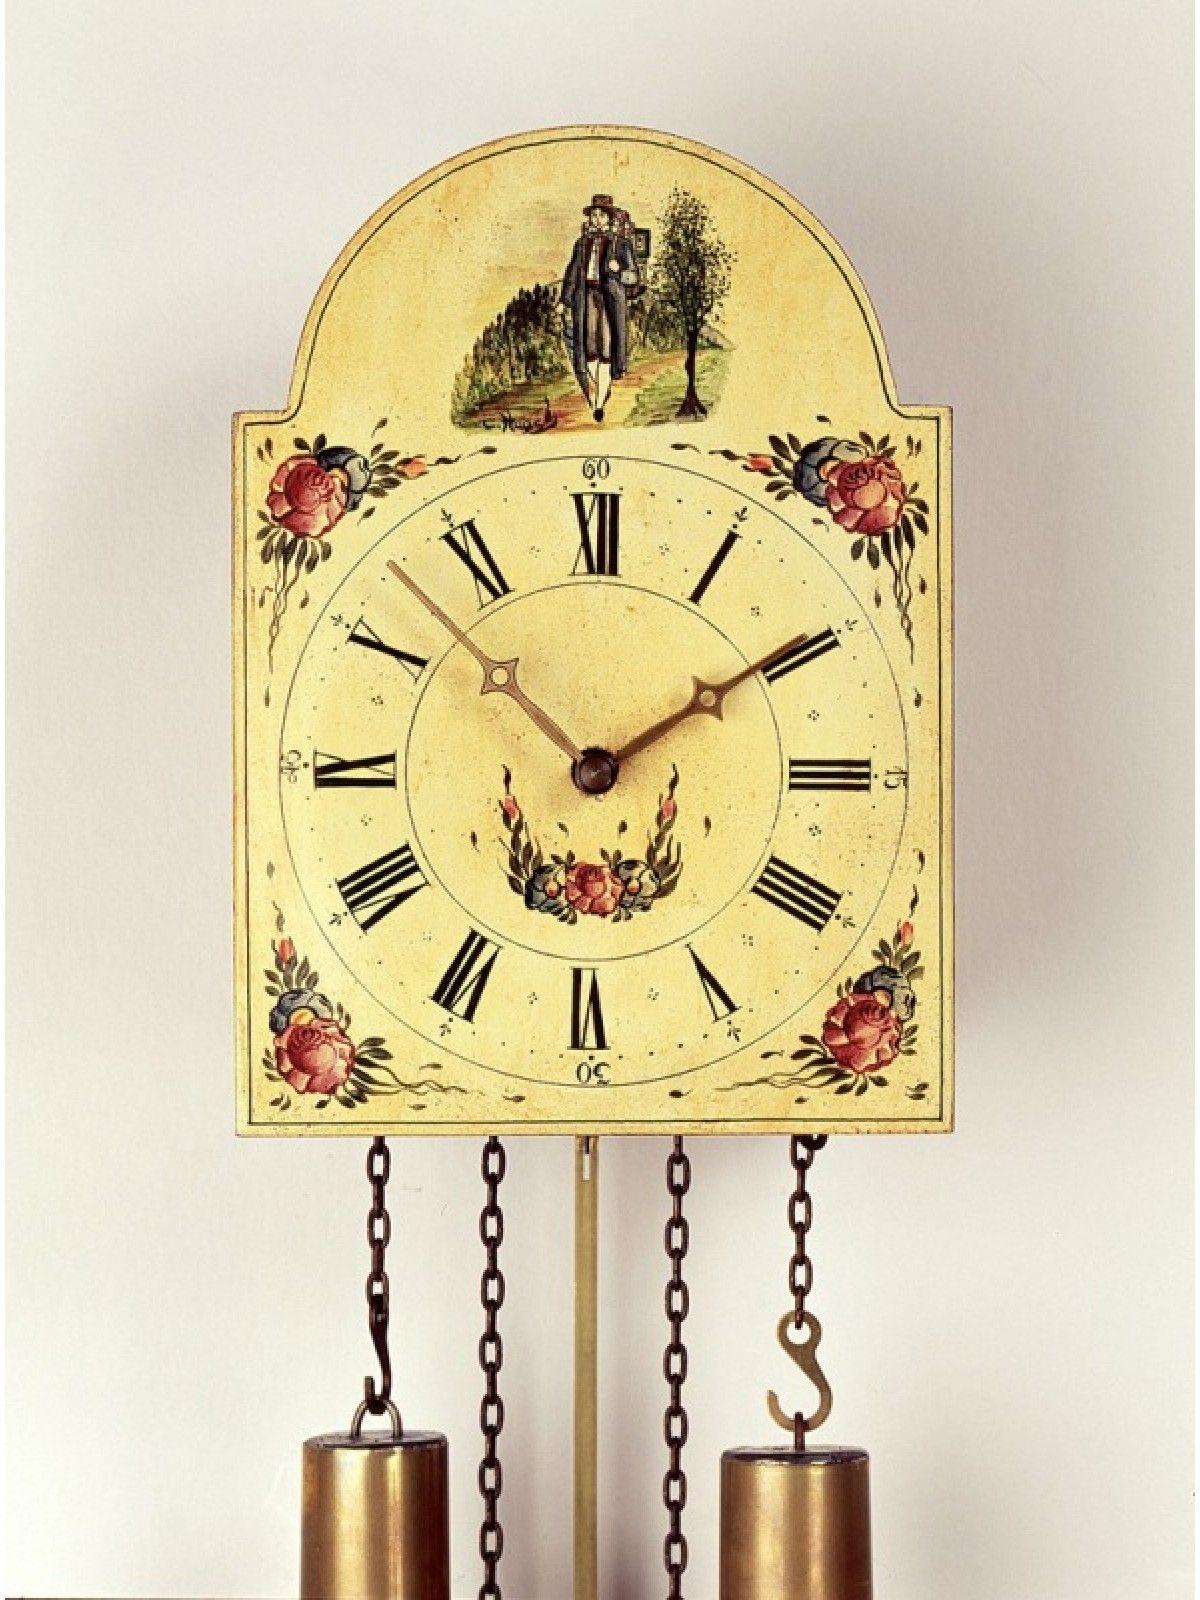 8 Tag Schilderuhr Vintage Klokken Klok Oude Klokken